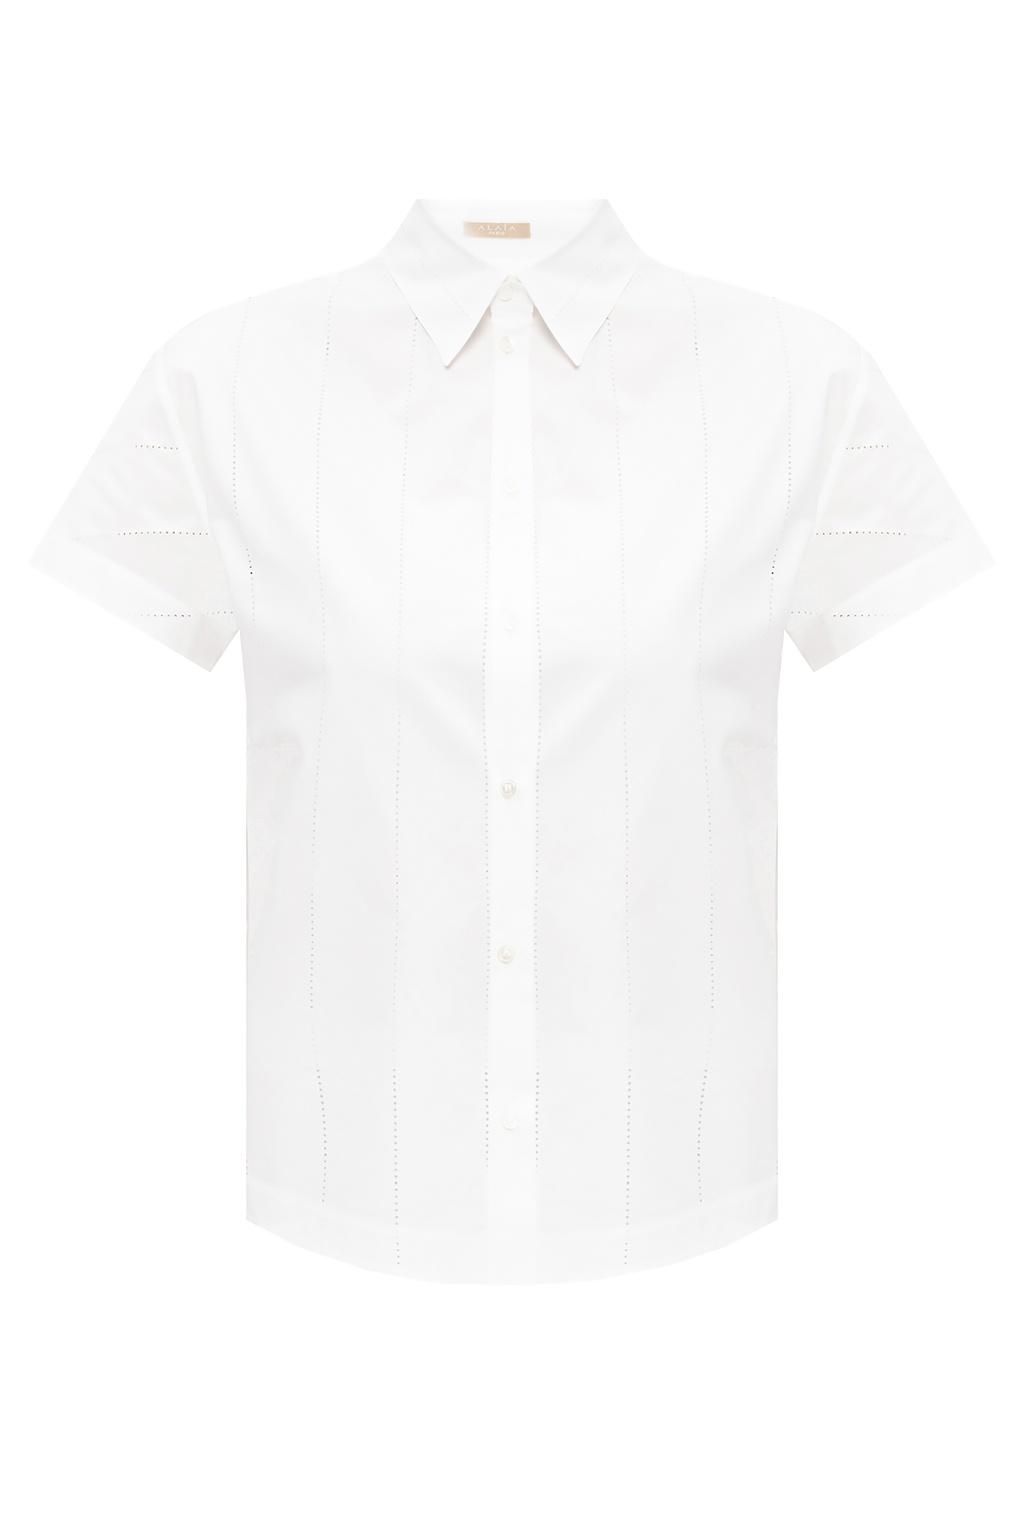 Alaia Shirt with slits